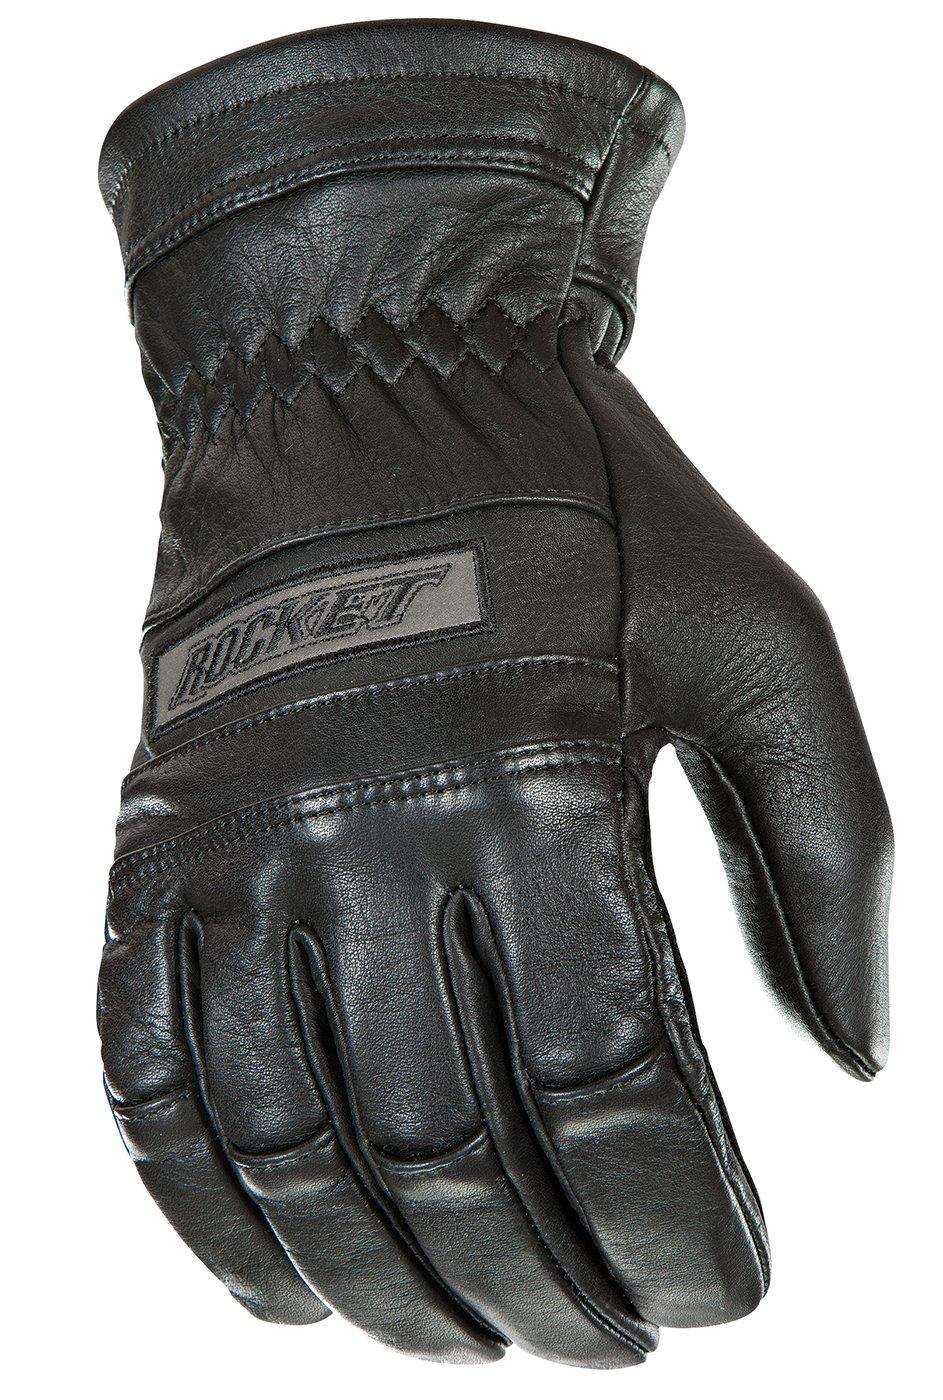 Joe Rocket Classic Men's Motorcycle Riding Gloves (Black, XX-Large)